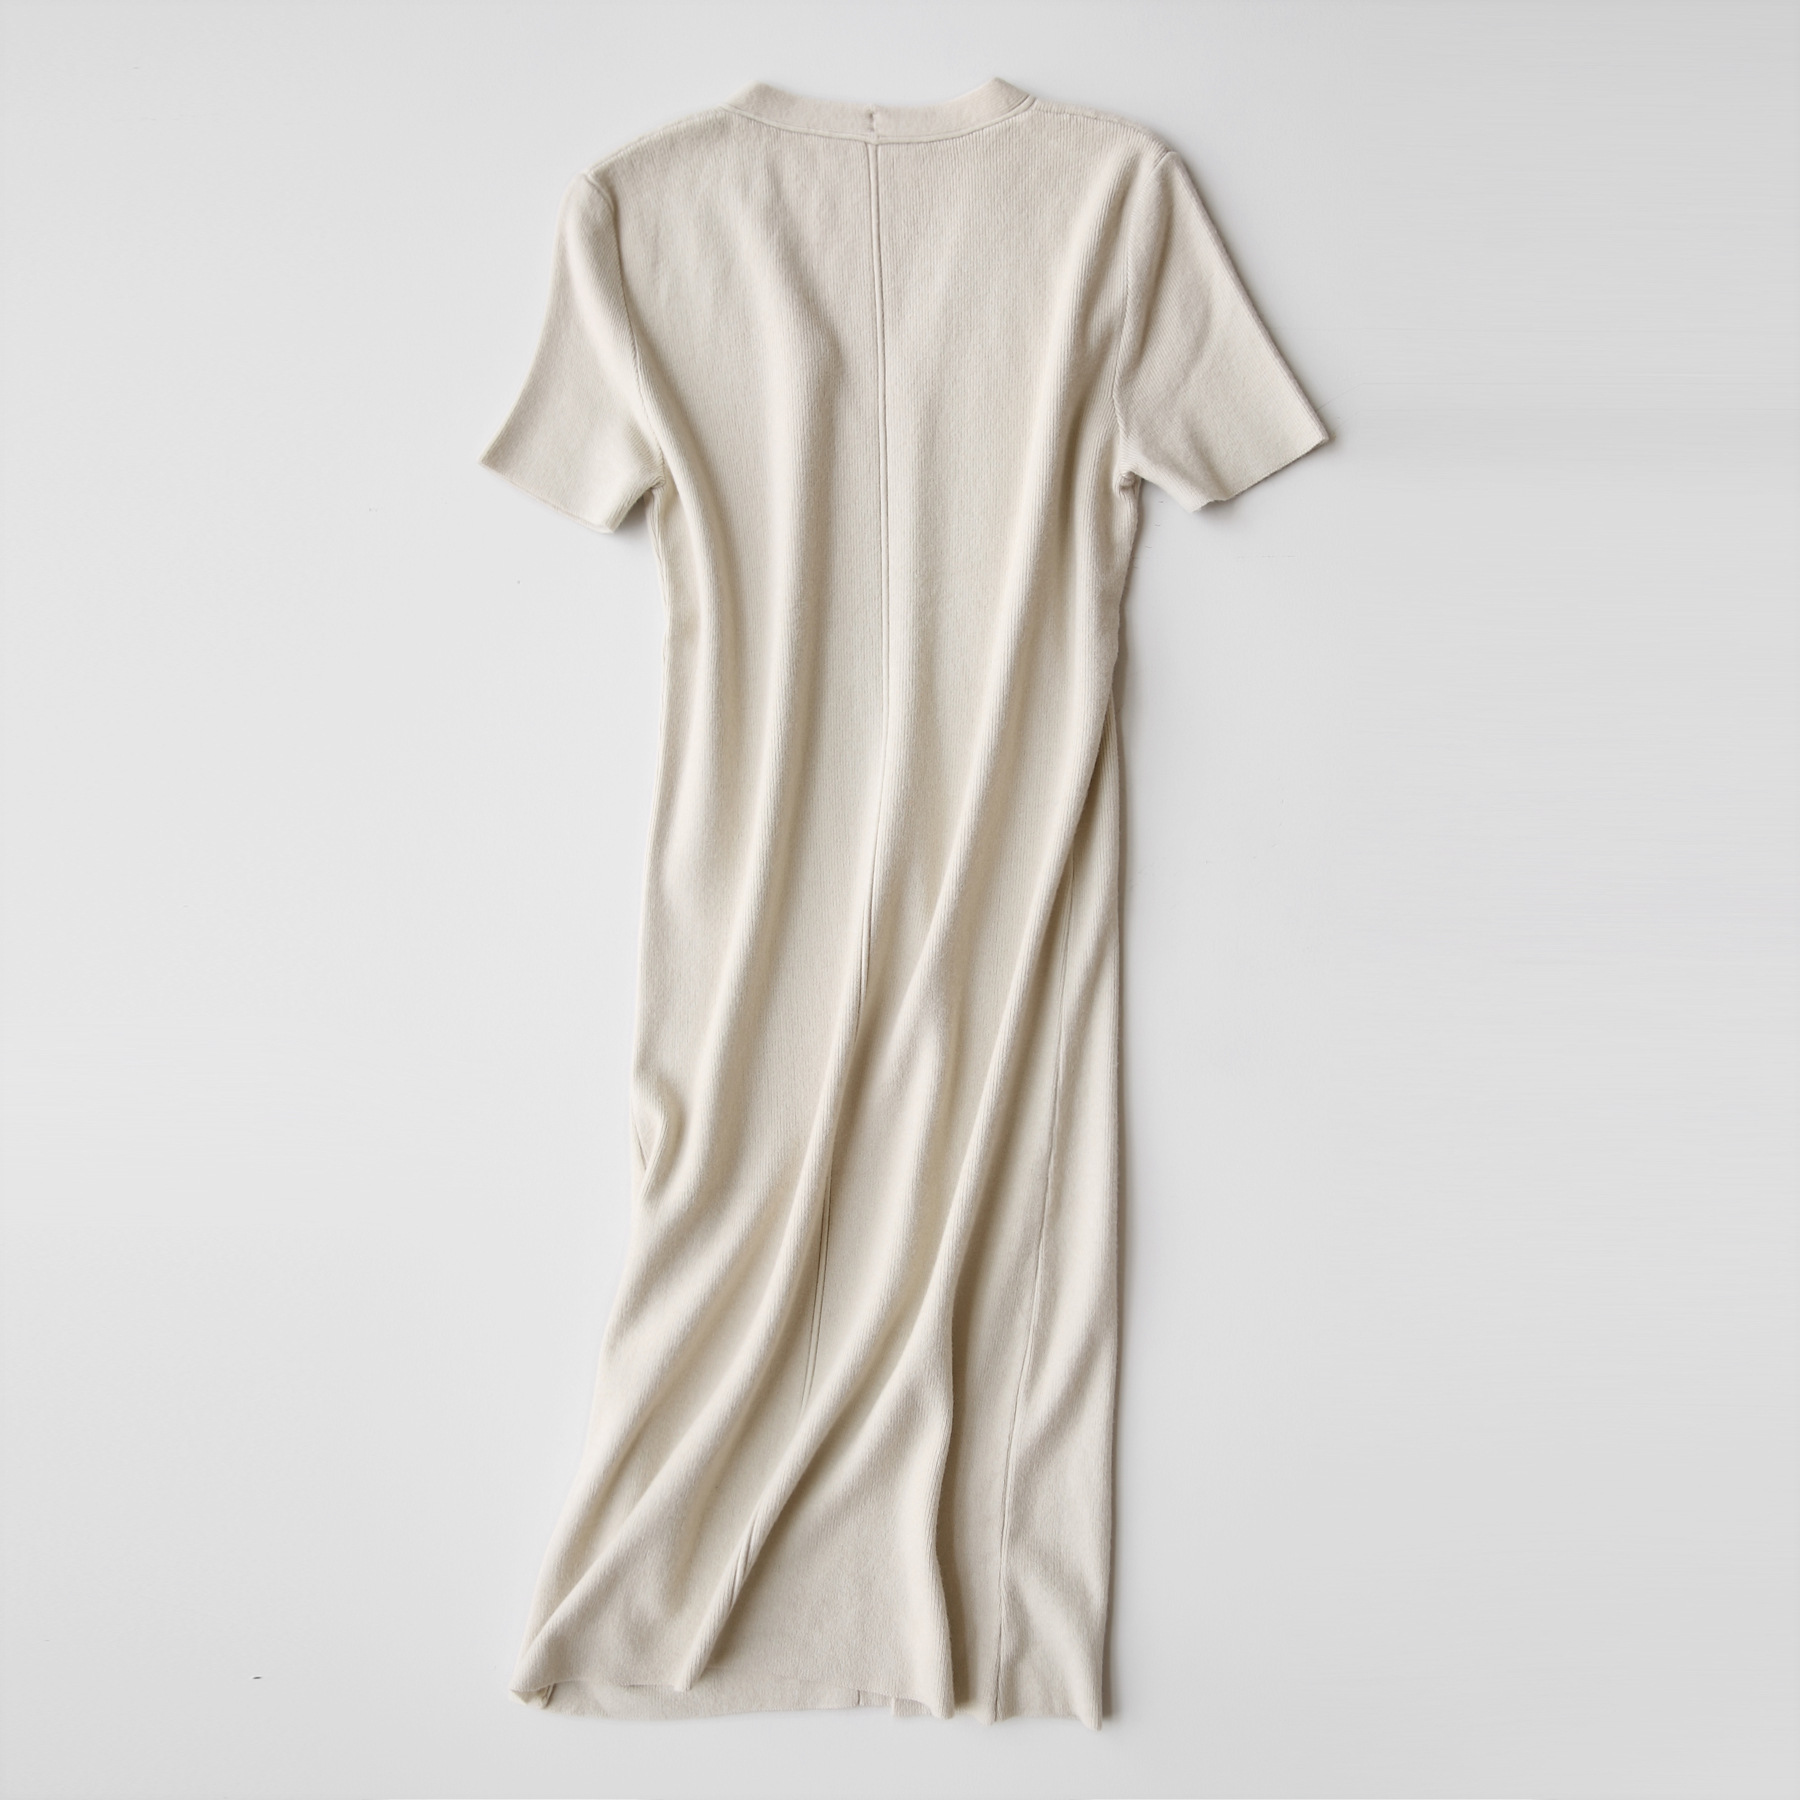 V neck Spring summer dress woman 2019 new fashion Short sleeve Knee Length bodycon dress Casual midi dress Female